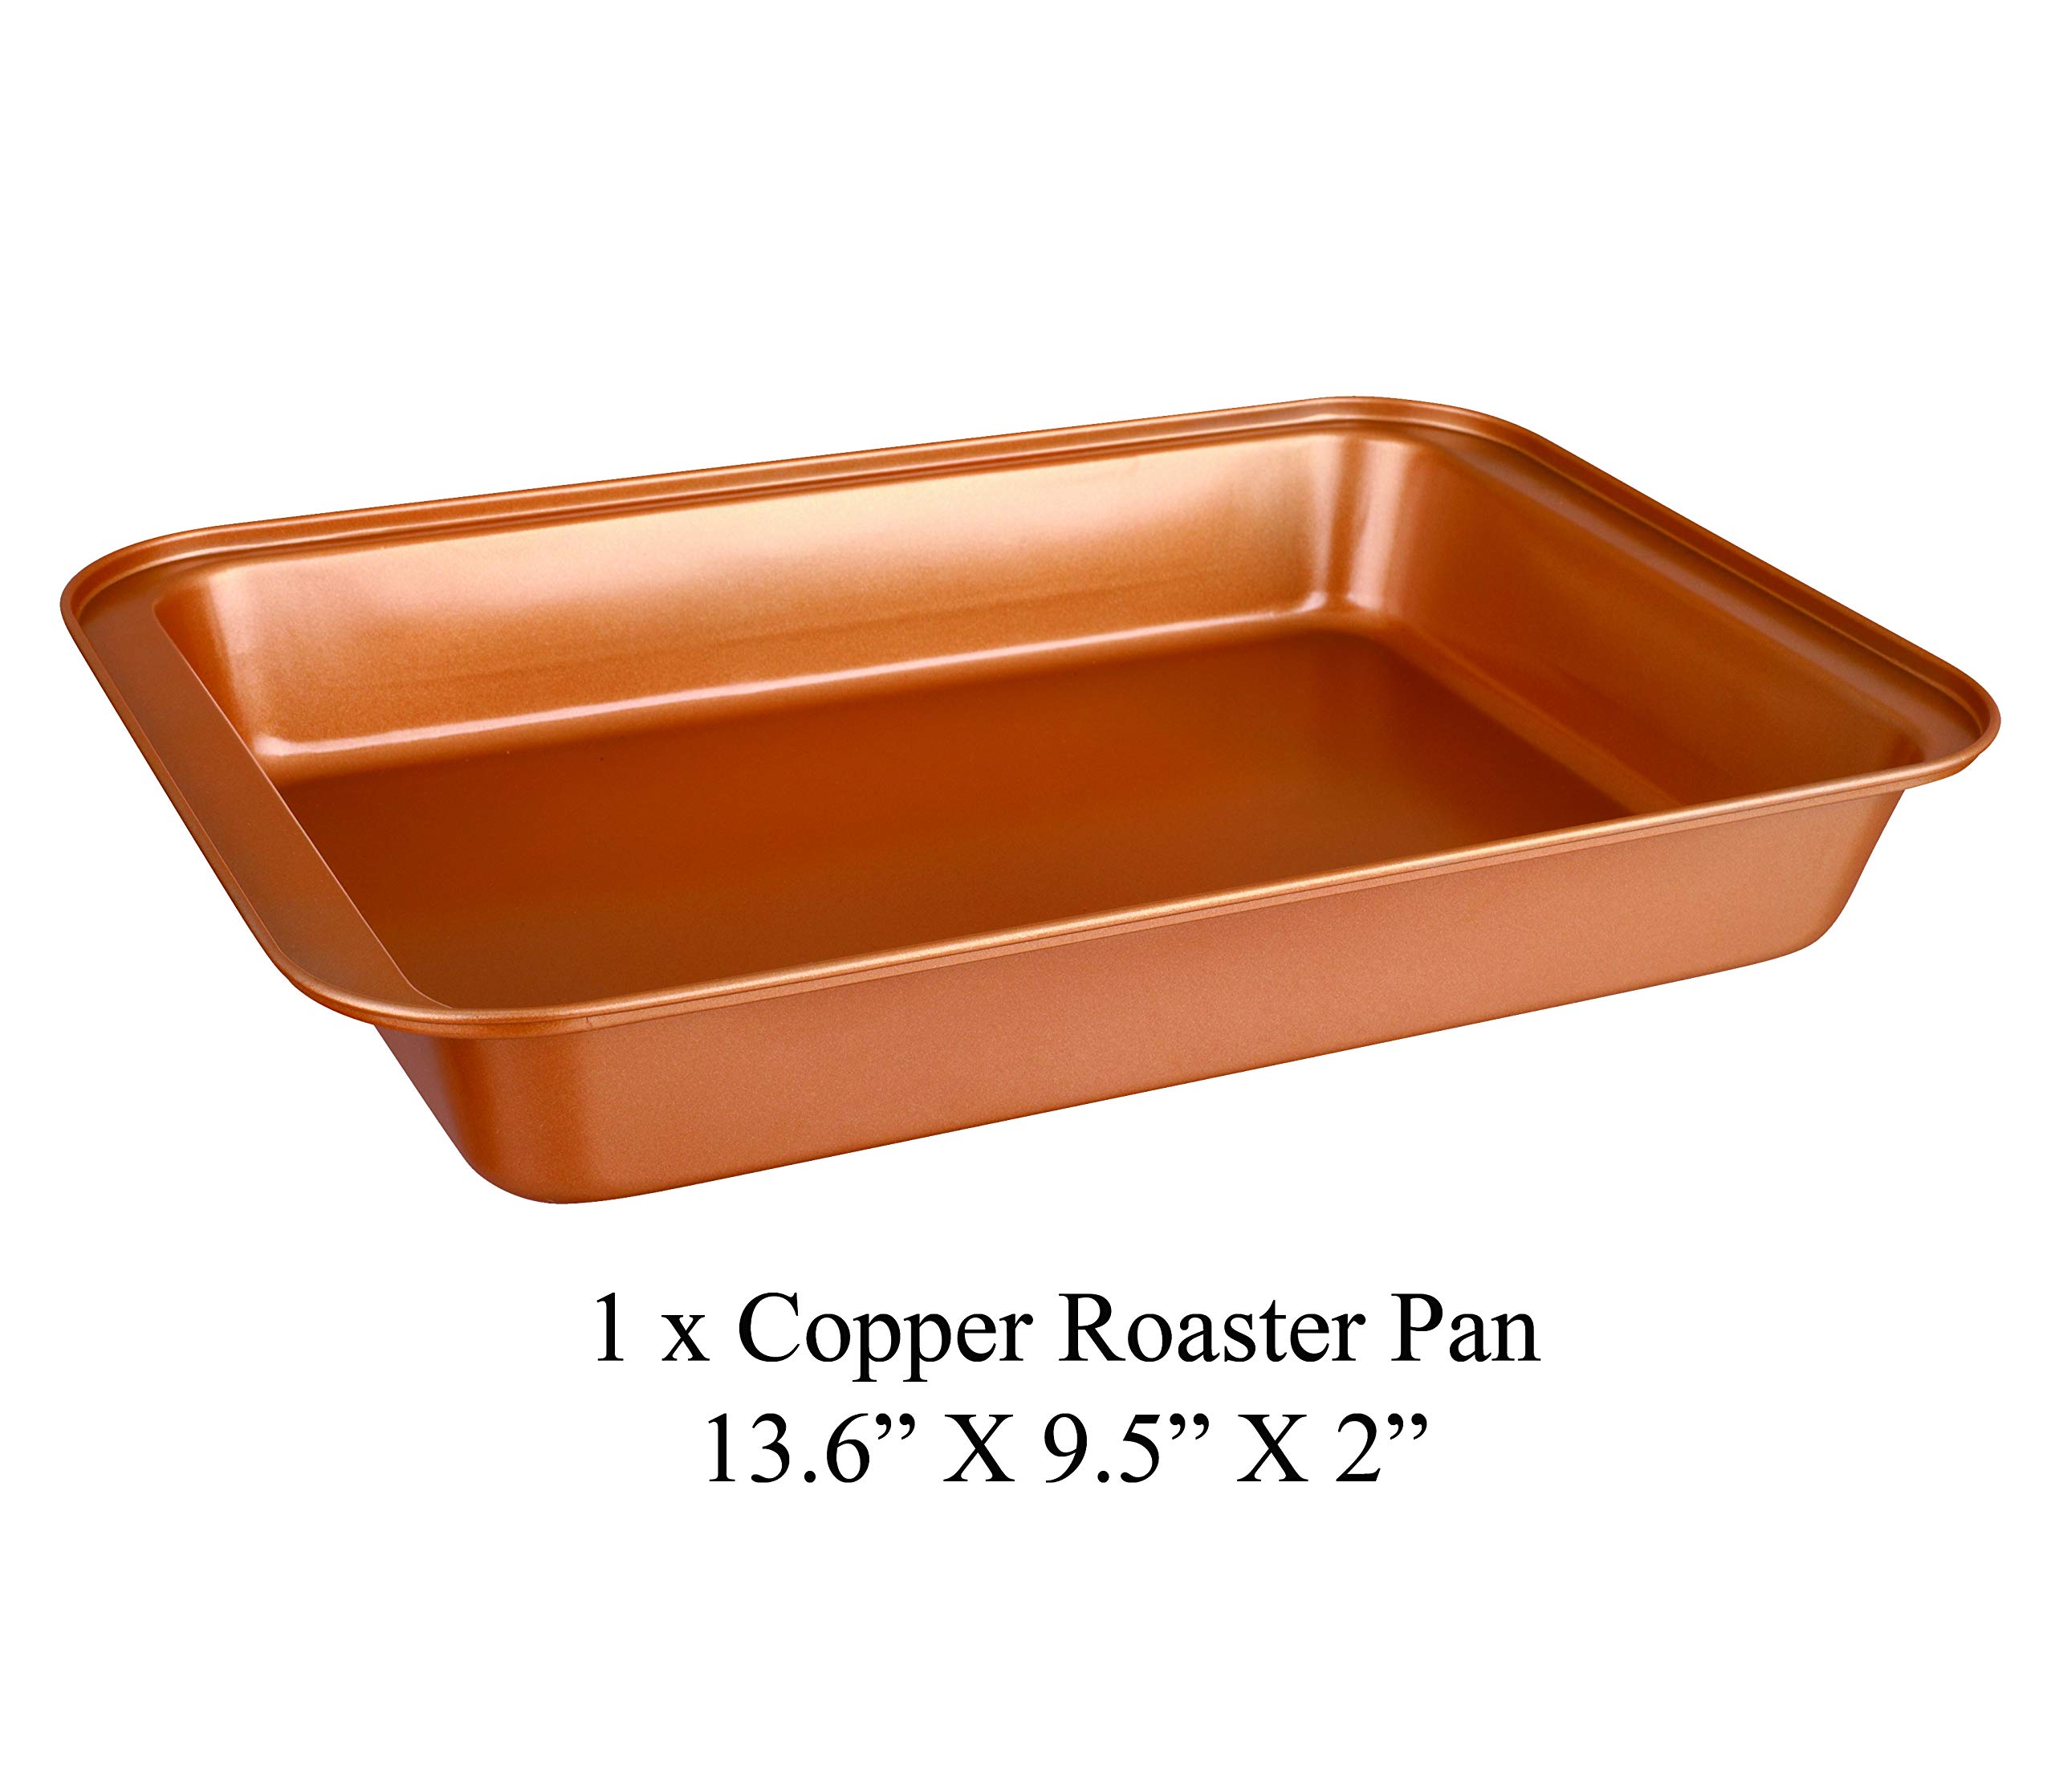 CopperKitchen Baking Pans - 3 pcs Toxic Free NONSTICK - Organic Environmental Friendly Premium Coating - Durable Quality - Rectangle Pan, Cookie Sheet - BAKEWARE SET (3) by CopperKitchenUSA (Image #5)